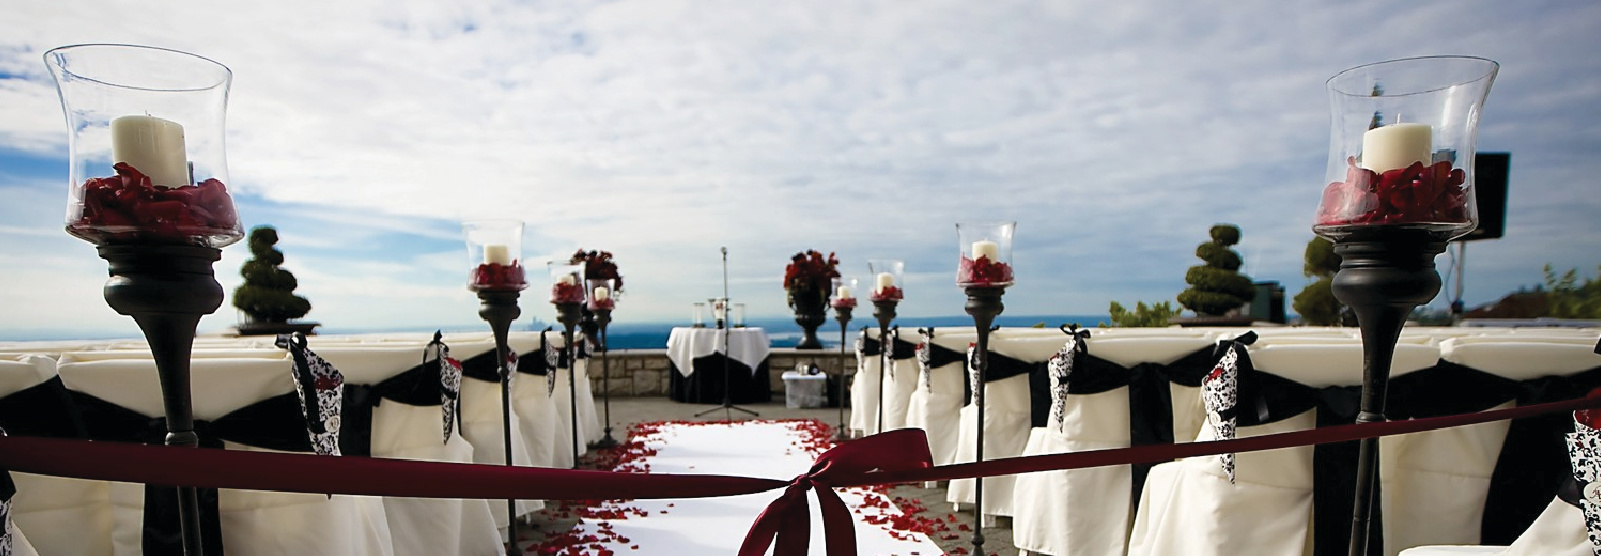 CBTS Wedding Planning Photo B